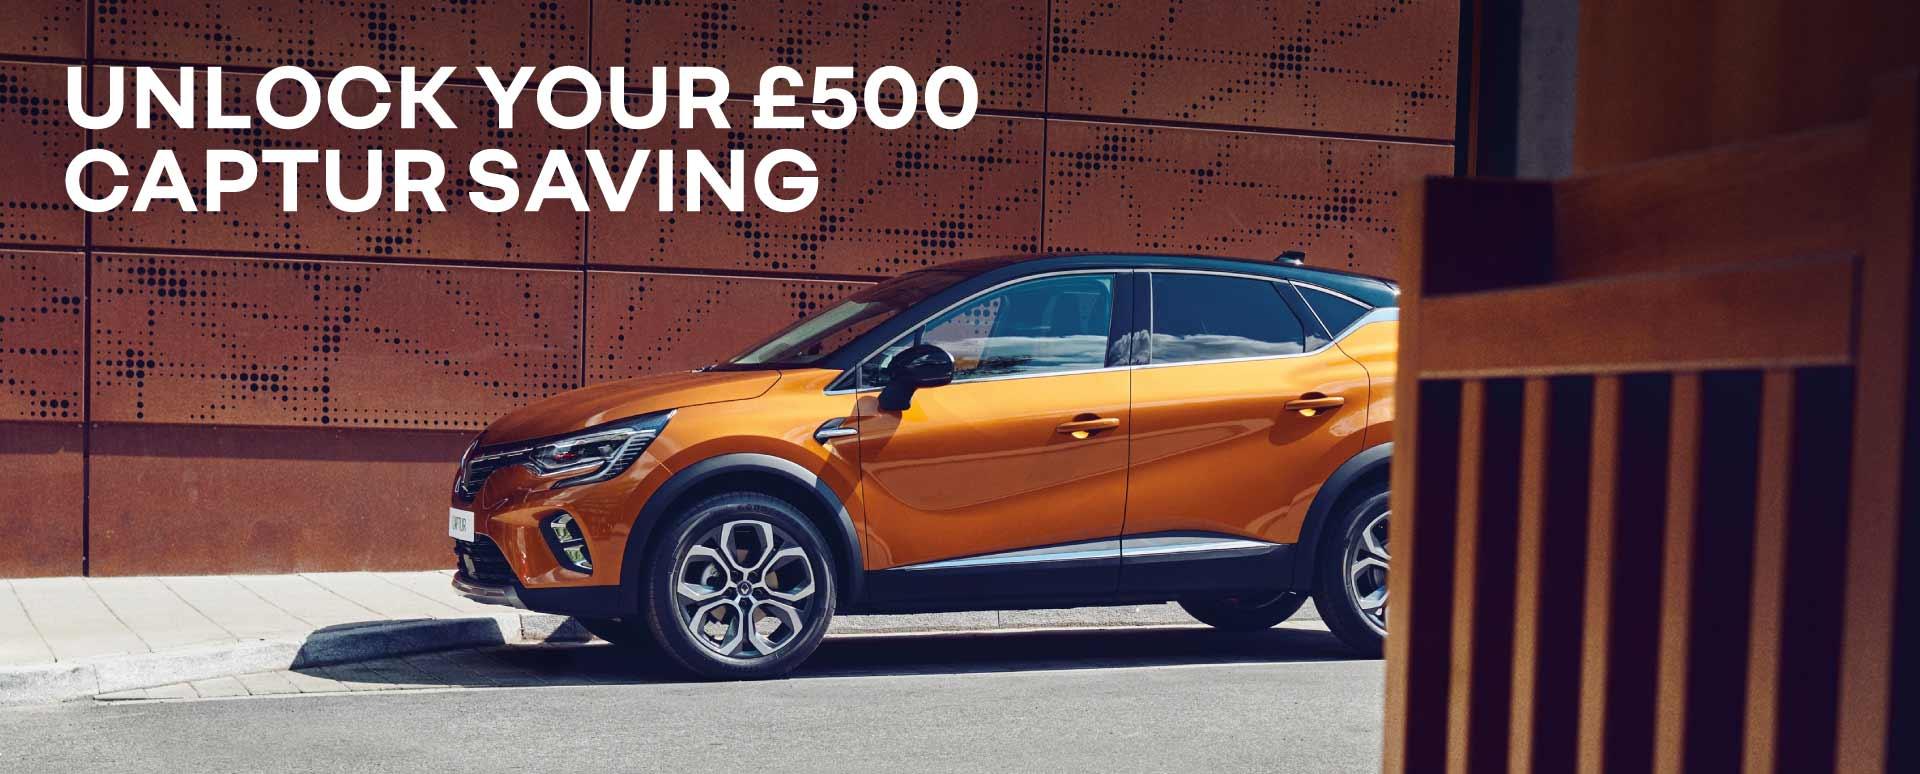 Renault Unlock Your Captur Saving